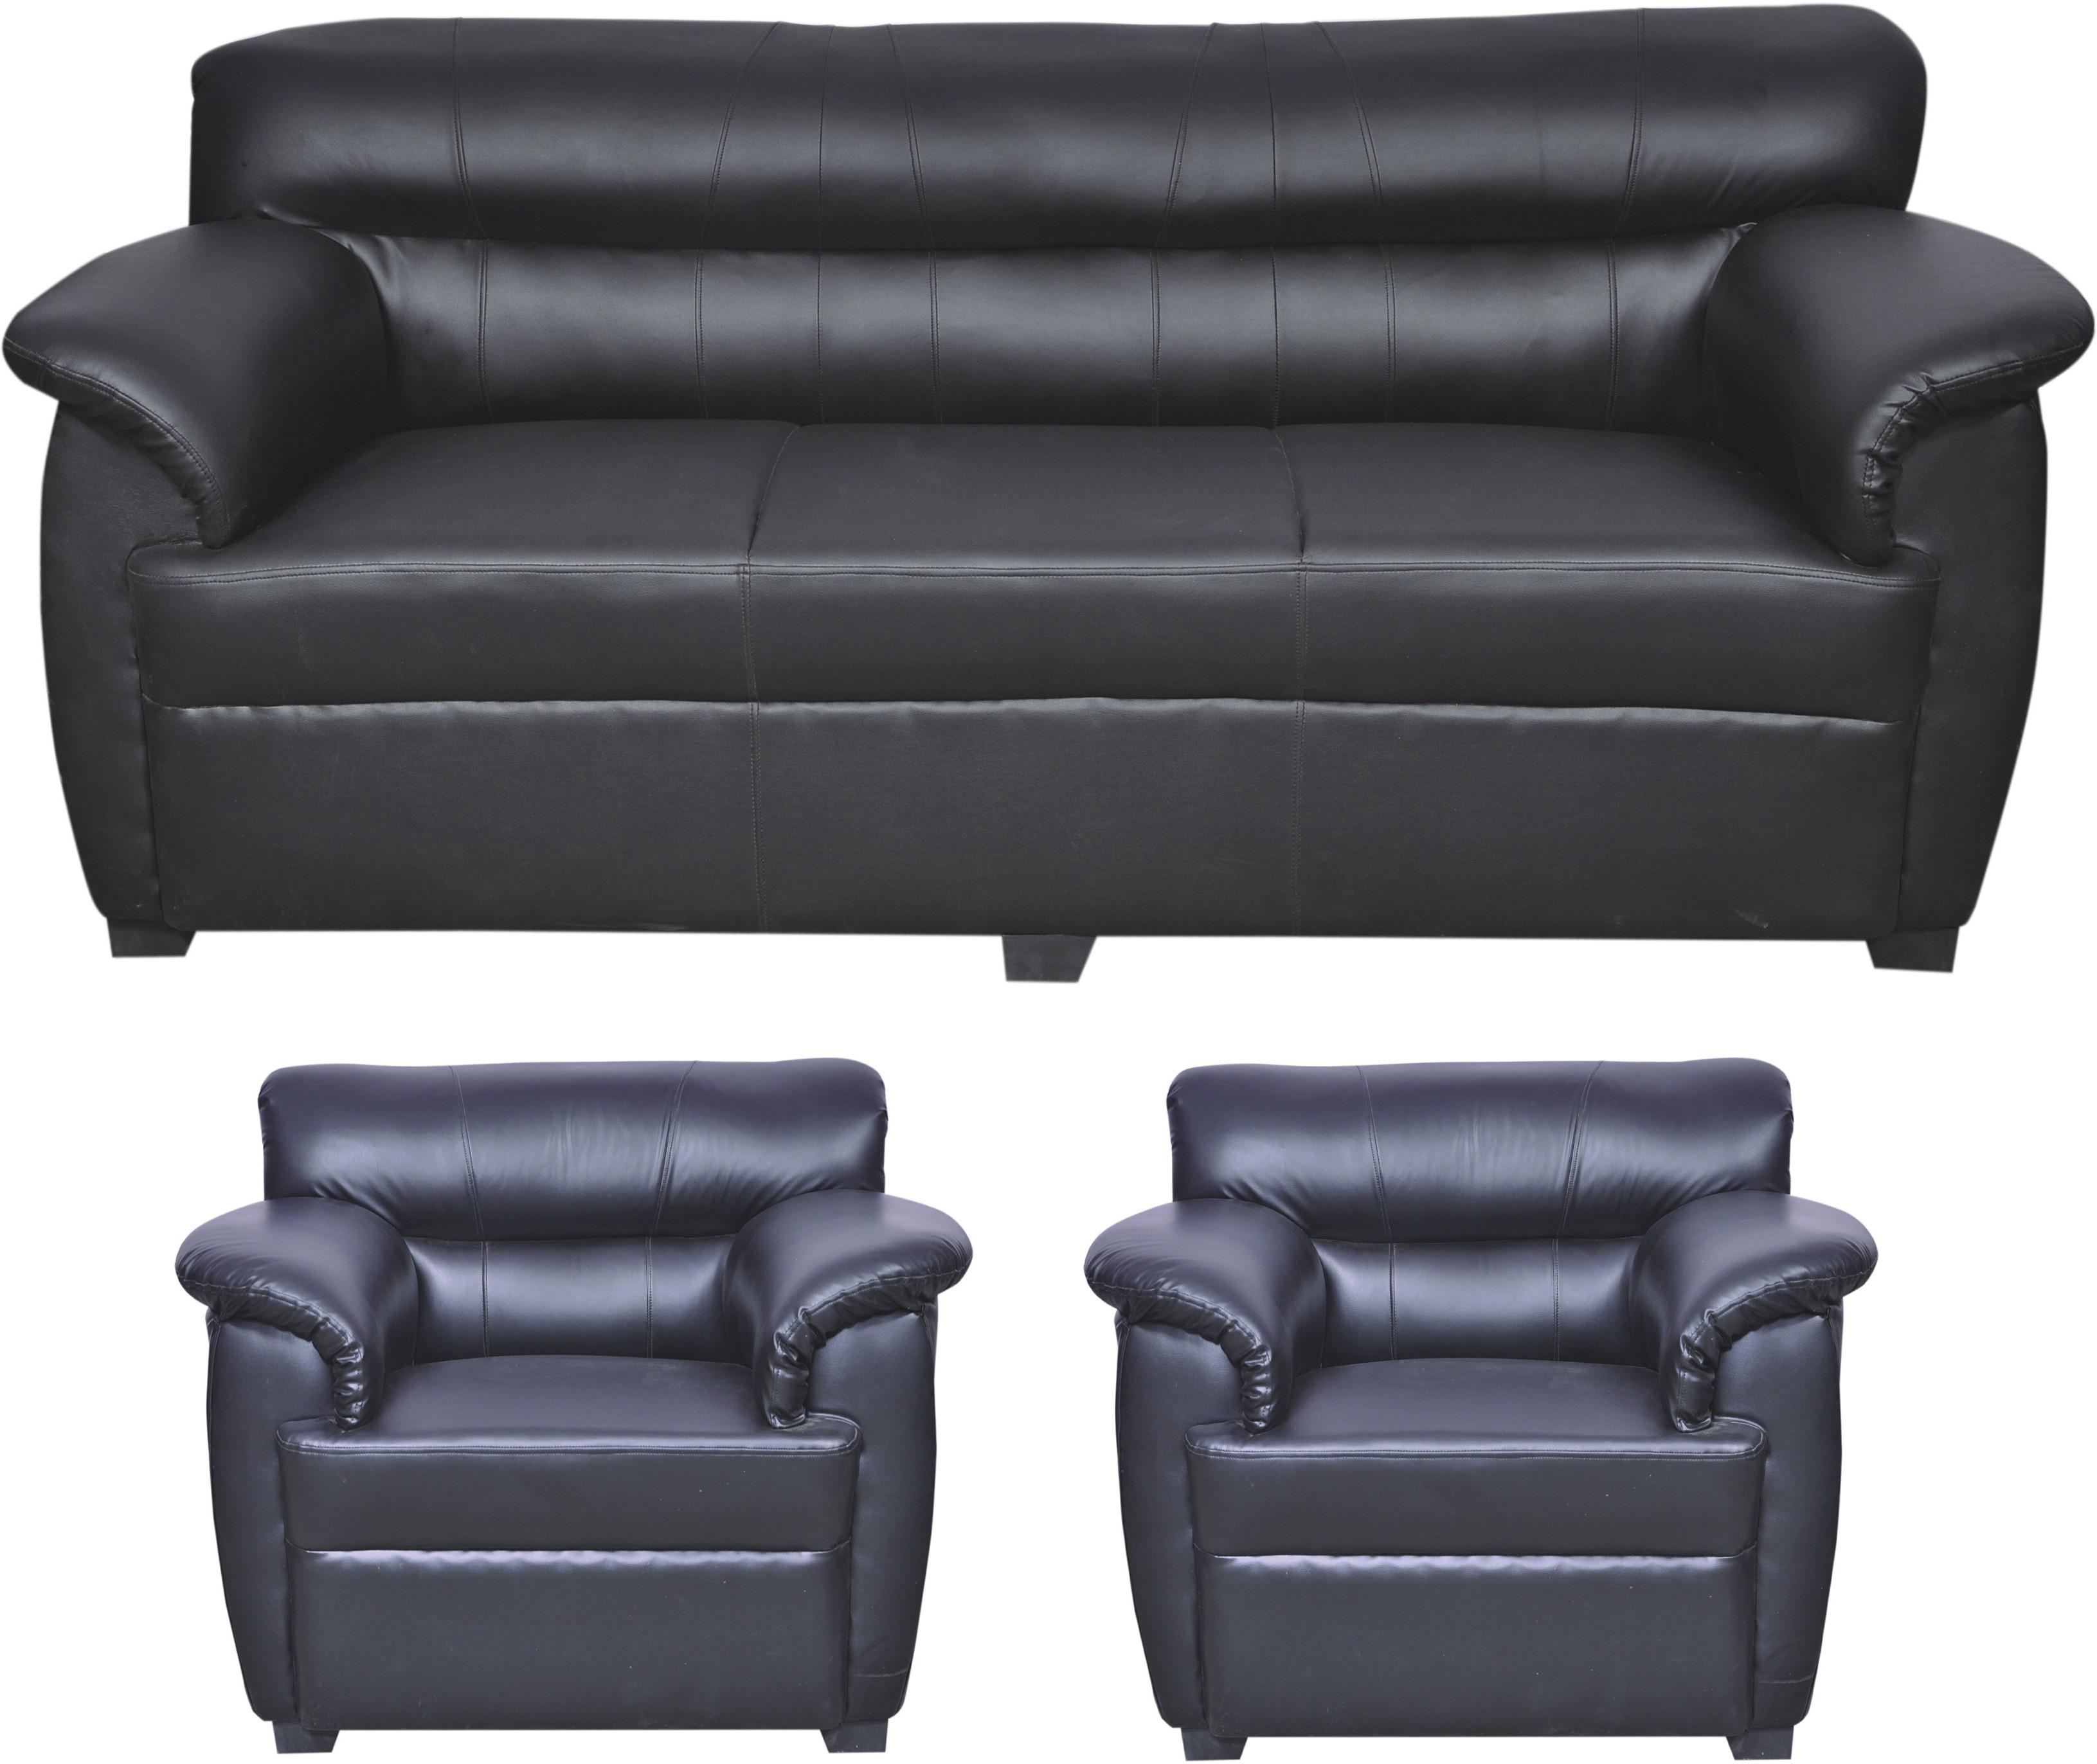 View HOMESTOCK Solid Wood 3 + 1 + 1 Black Sofa Set(Configuration - Straight) Furniture (HOMESTOCK)